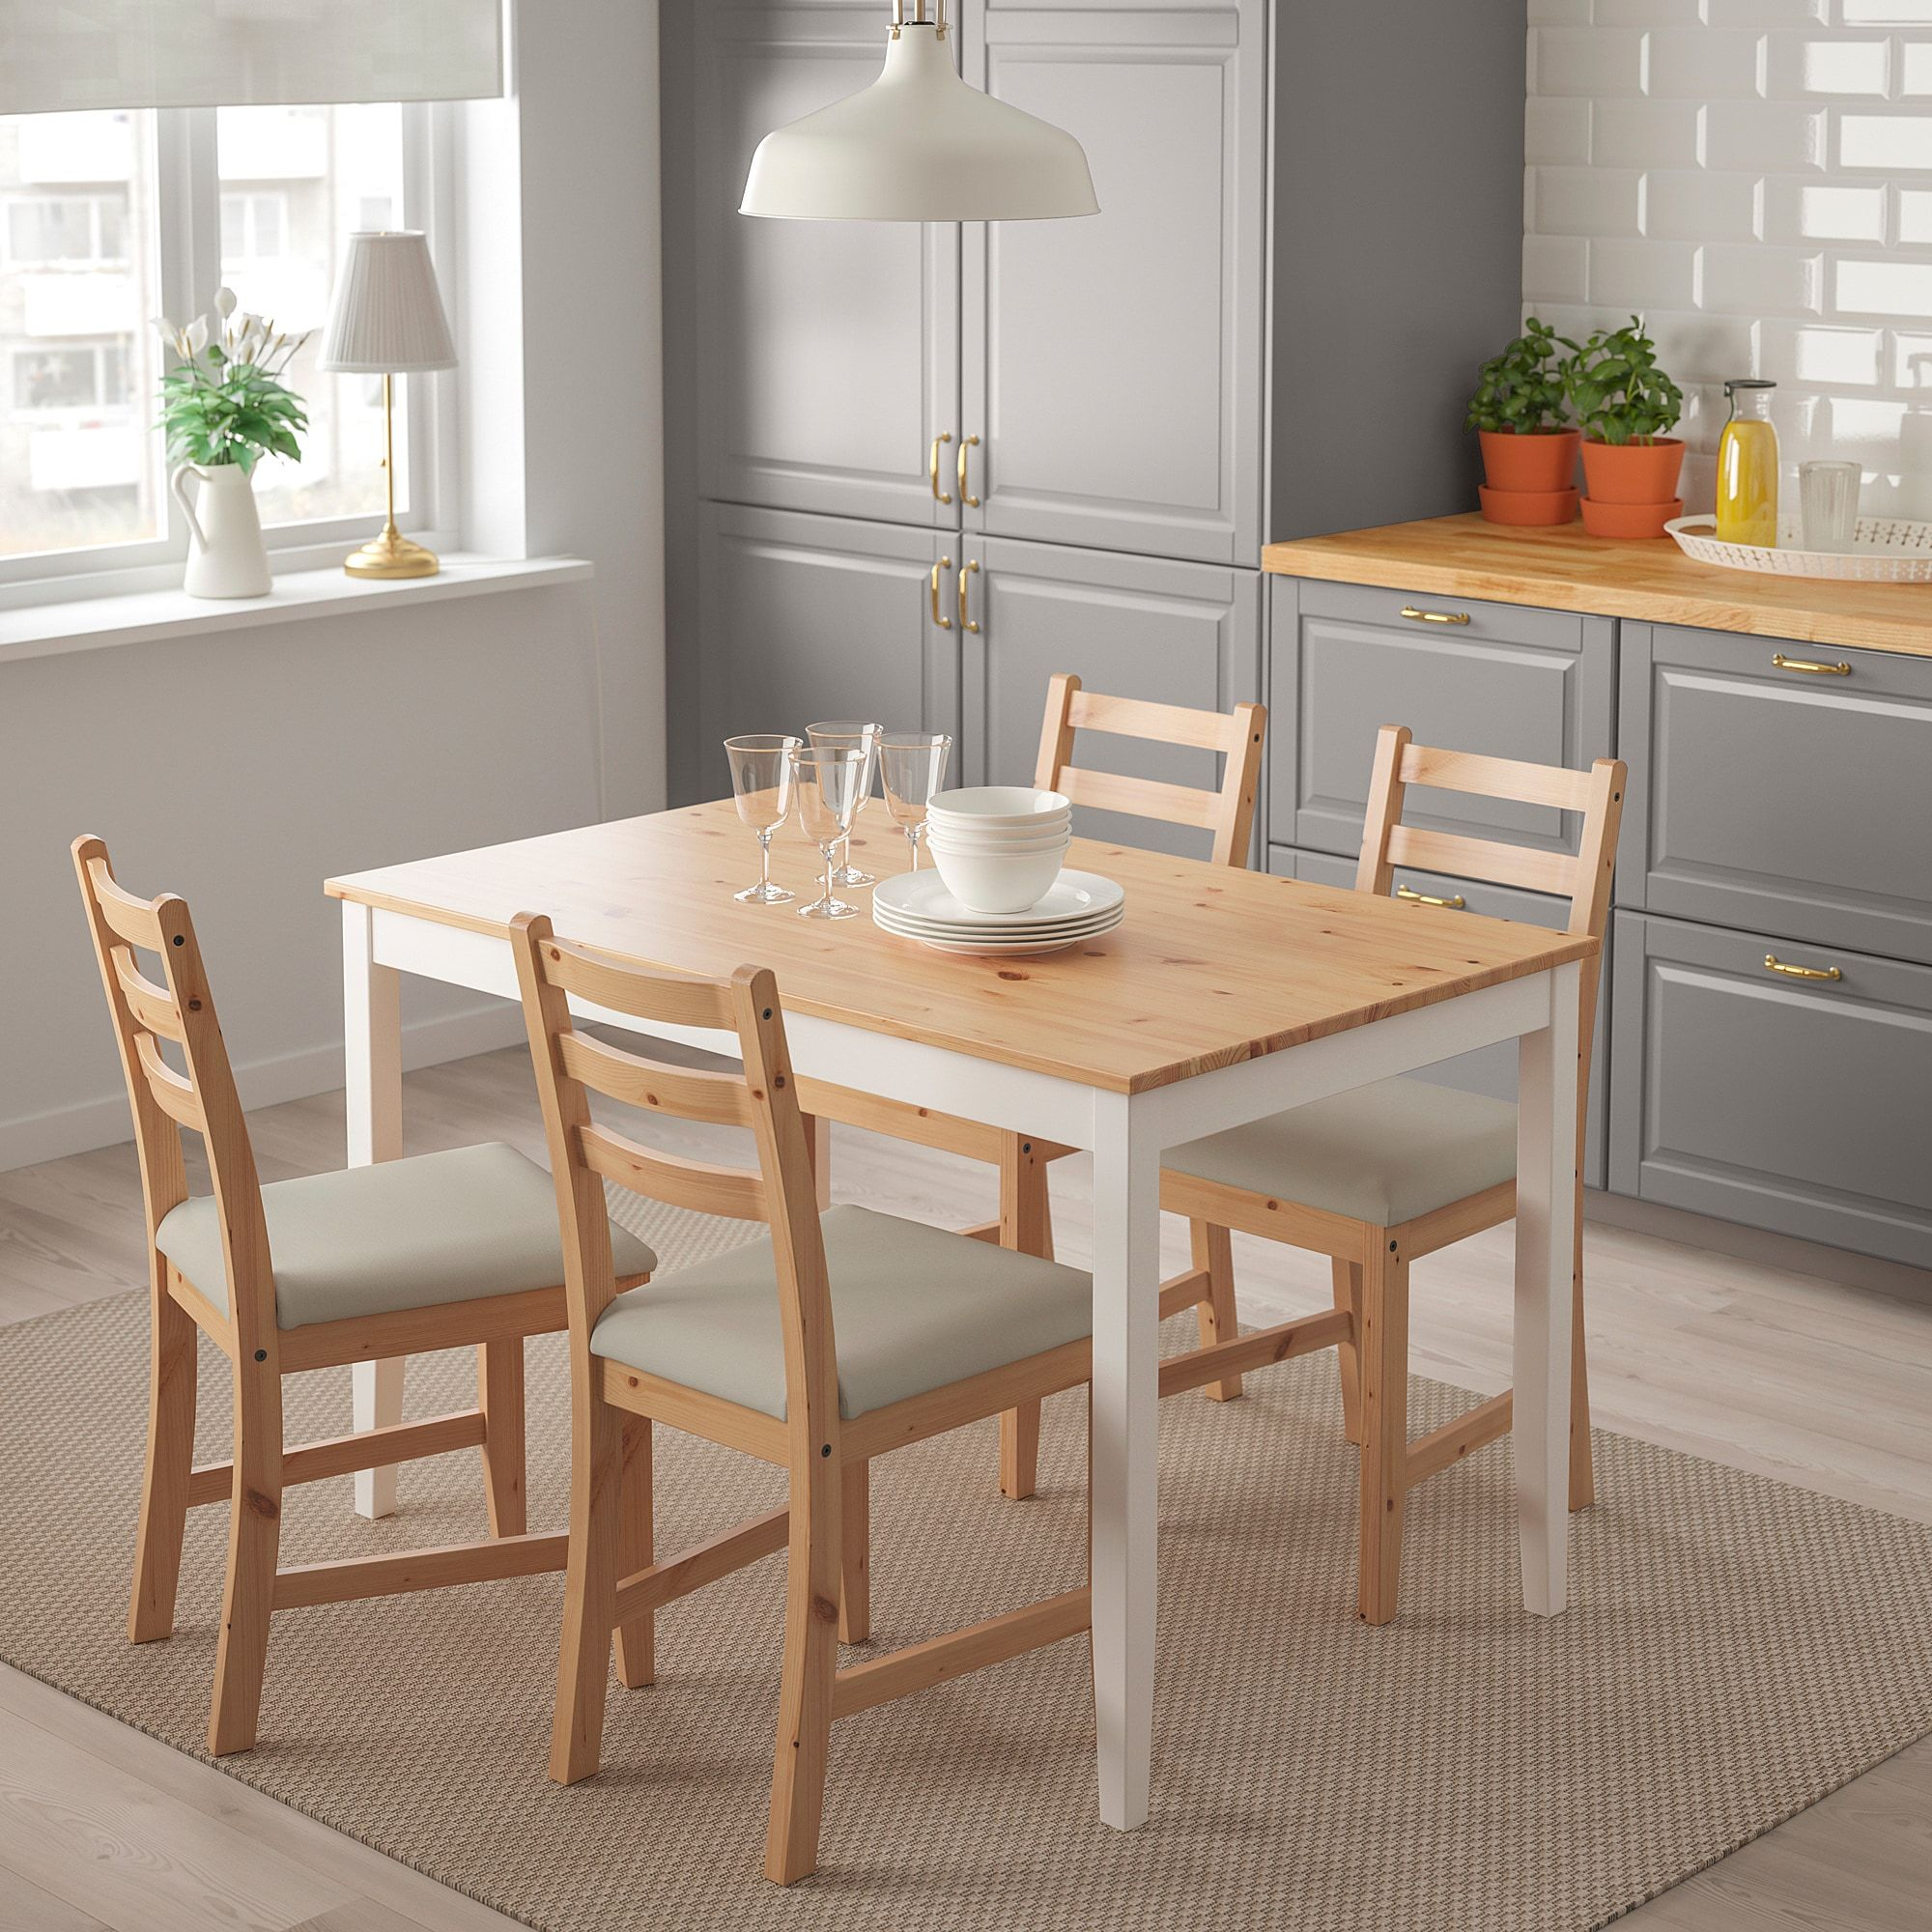 Ikea Lerhamn Chair Light Antique Stain Vittaryd Beige In